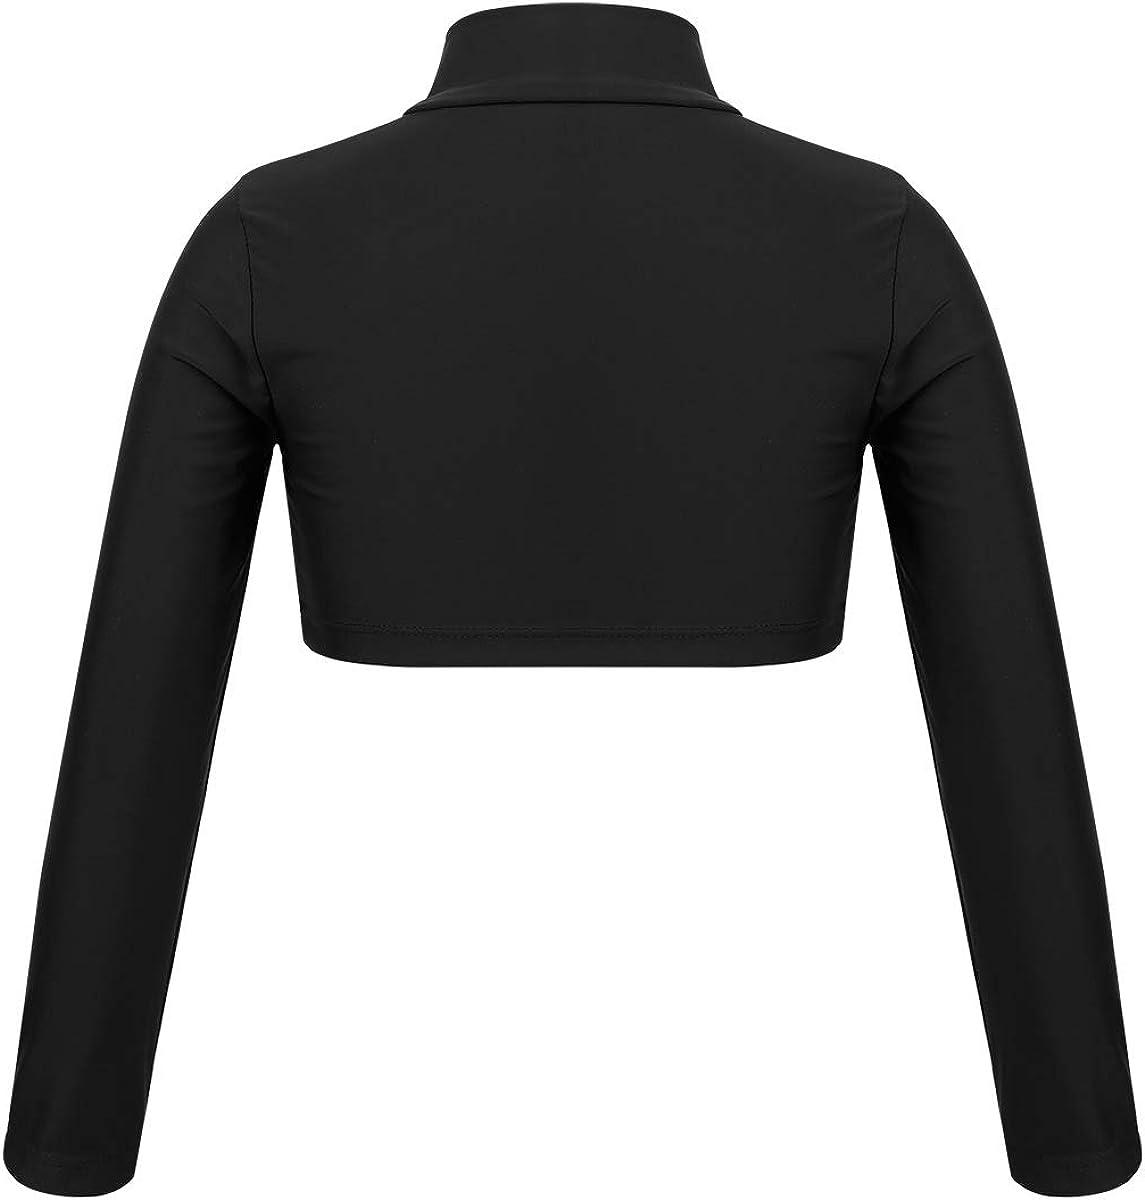 Hansber Kids Girls Crop Tops T-Shirt Mock Neck Long Sleeve Shirt for Jazz Dance Gymnastics Stage Performance